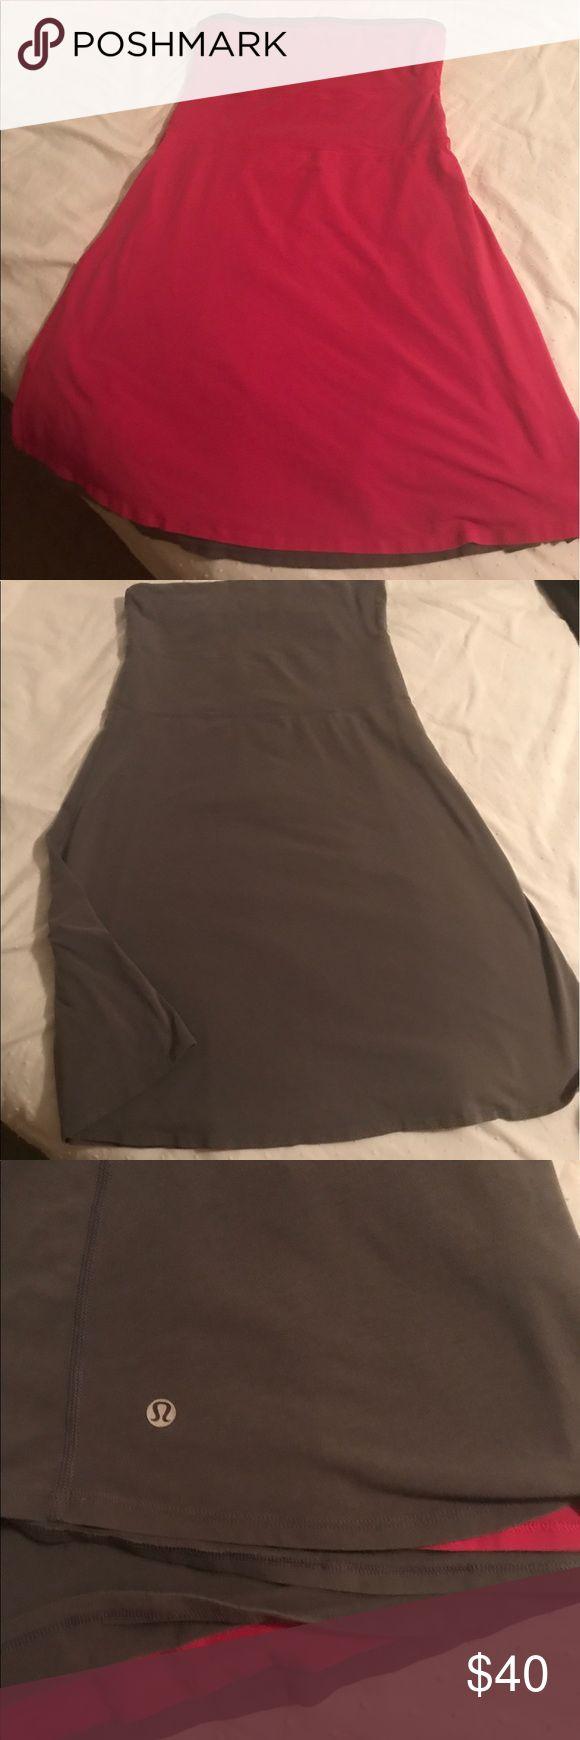 Lululemon dress Lululemon pink and gray strapless reversible dress, size medium no tag. Perfect for summer lululemon athletica Dresses Strapless